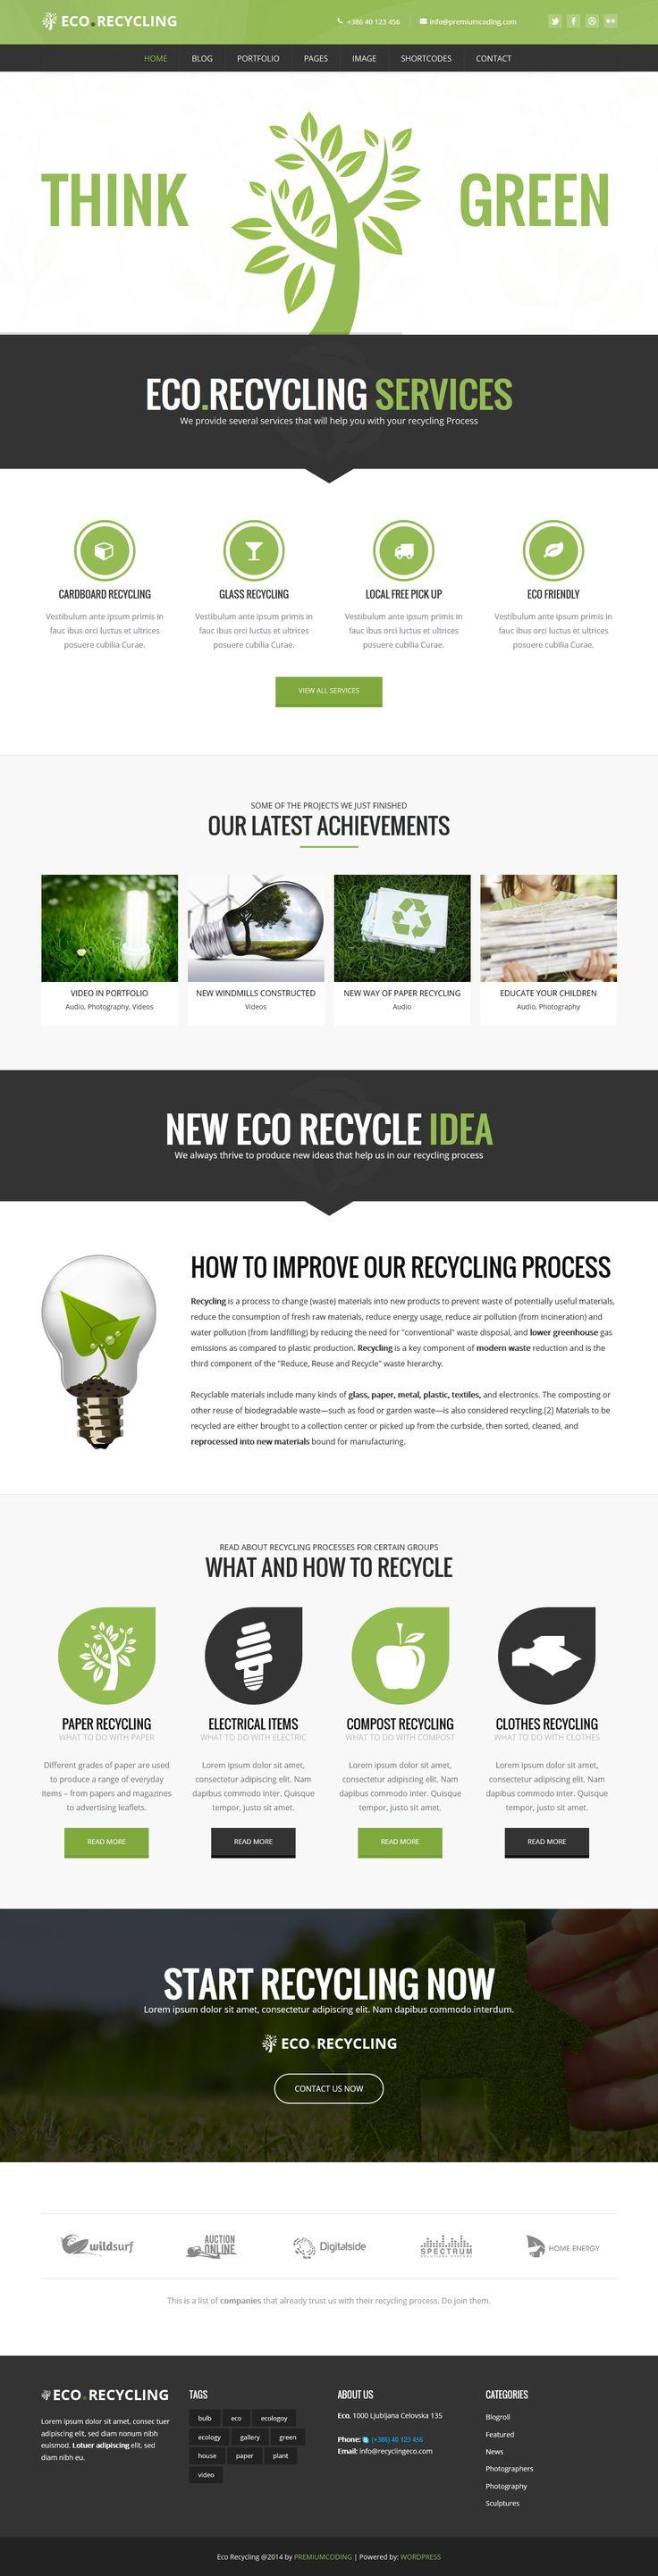 EcoRecycling - a Multipurpose Wordpress Theme #enviromental #web #design #eco